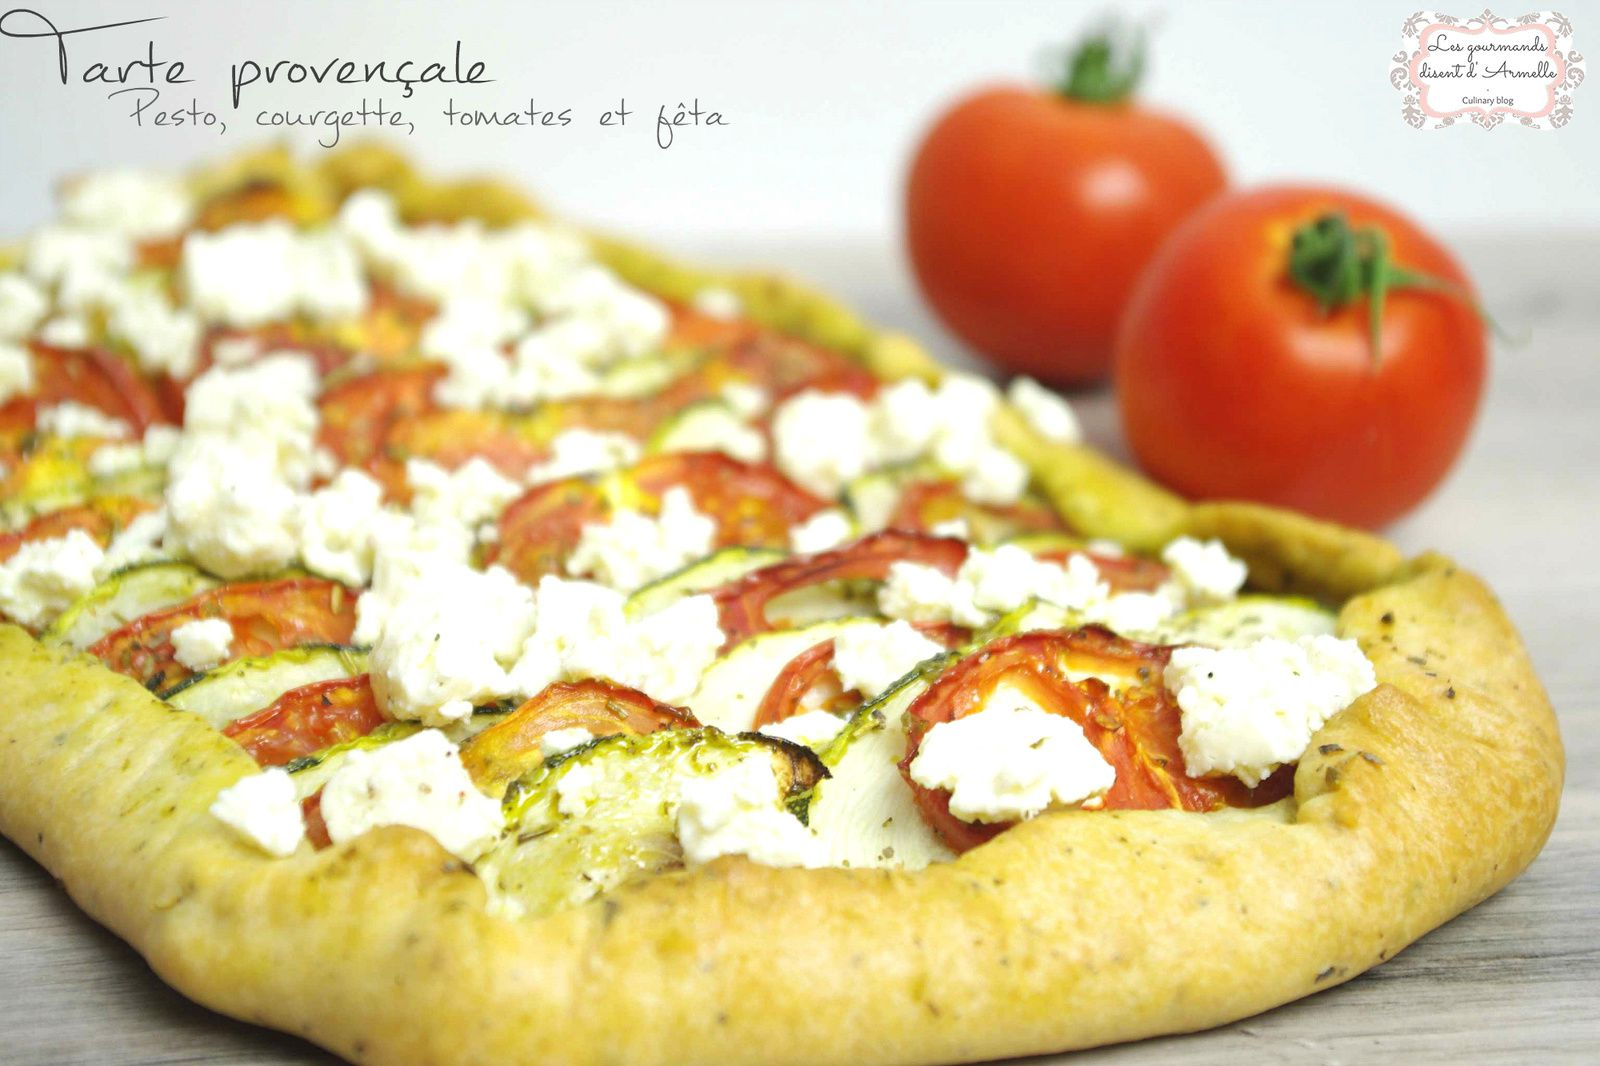 | Tarte provençale | Pesto, courgette, tomates et feta